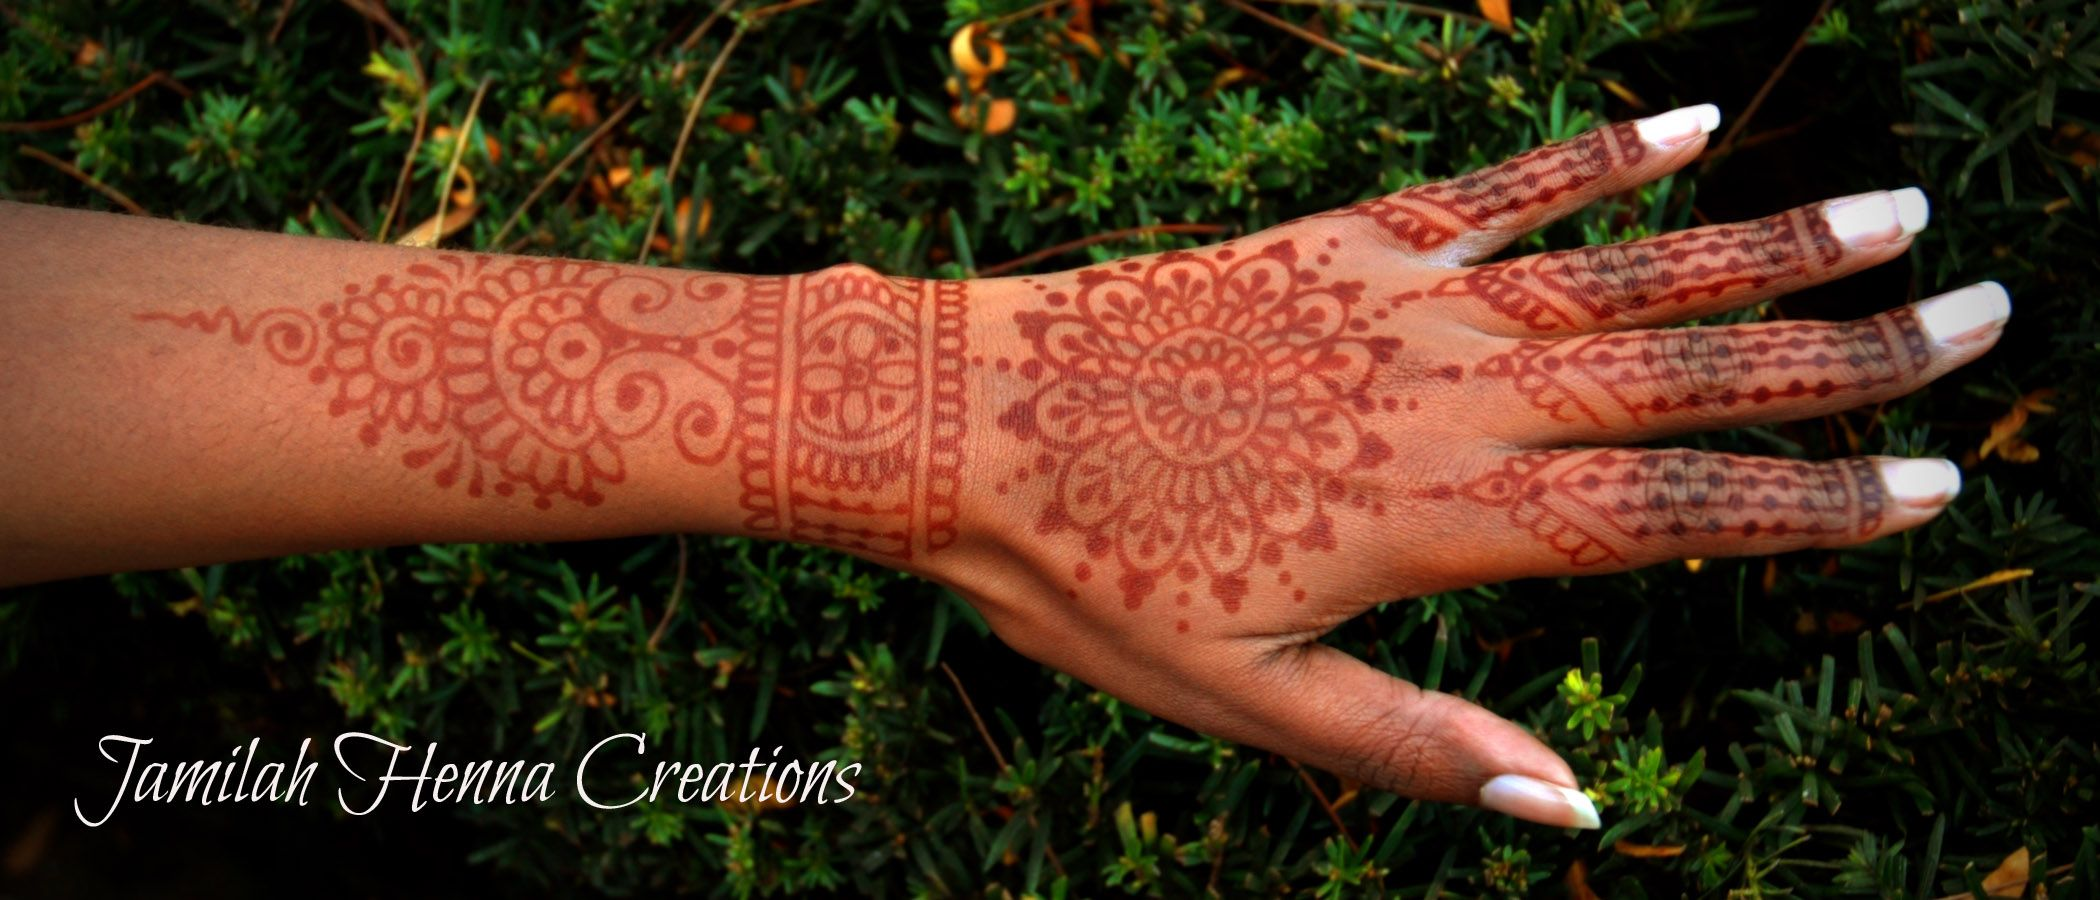 Henna Stain On Darker Skin Whoot Www Jamilahhennacreations Com